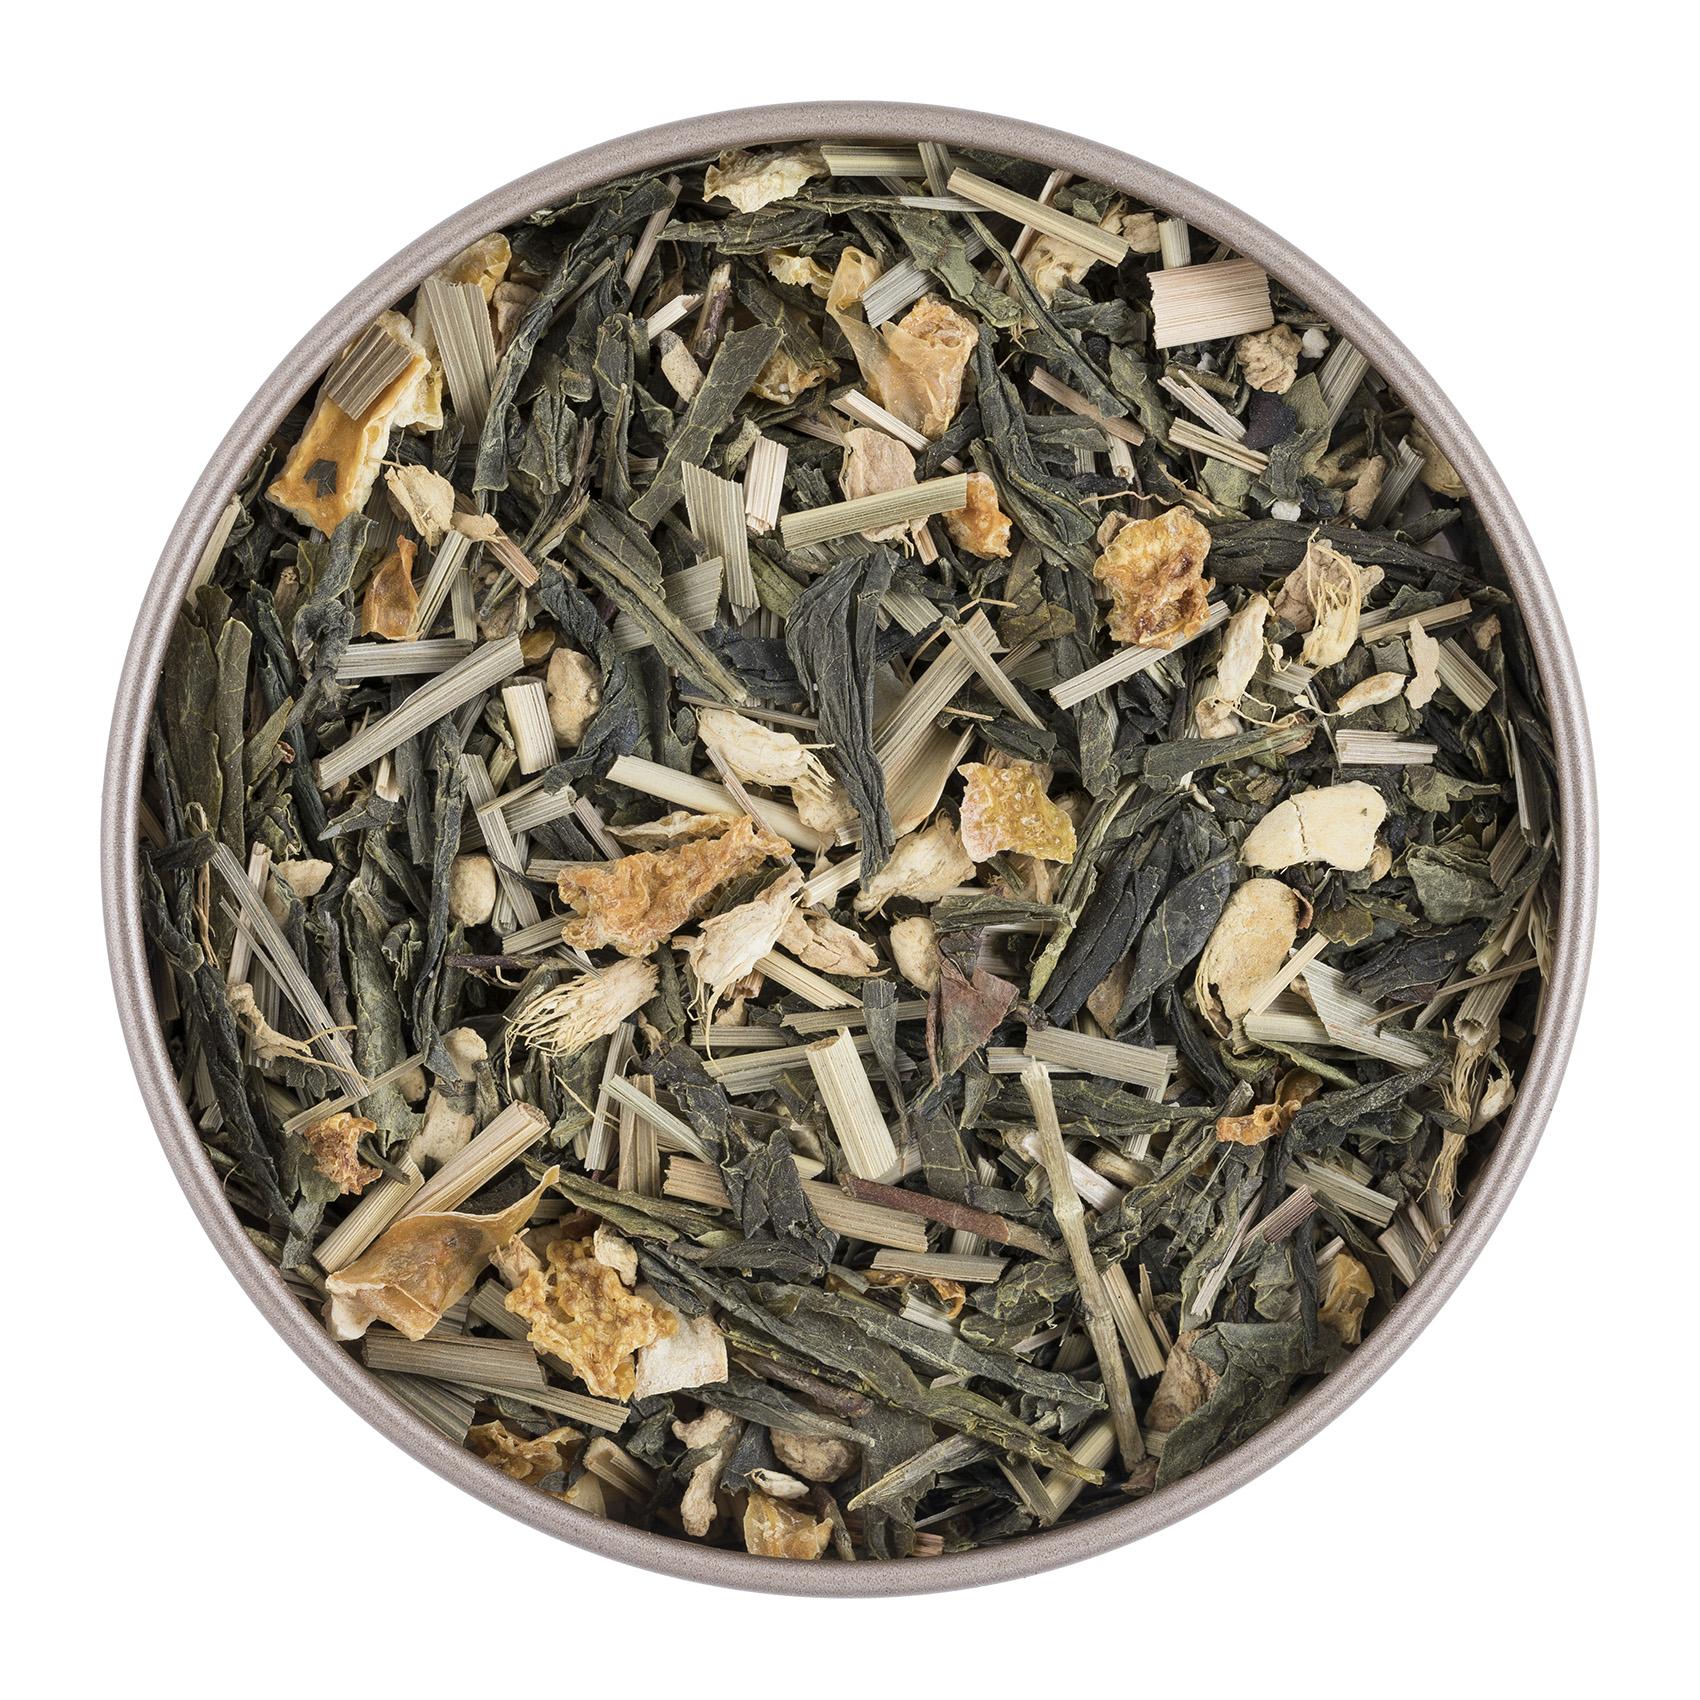 GREEN TEAS -